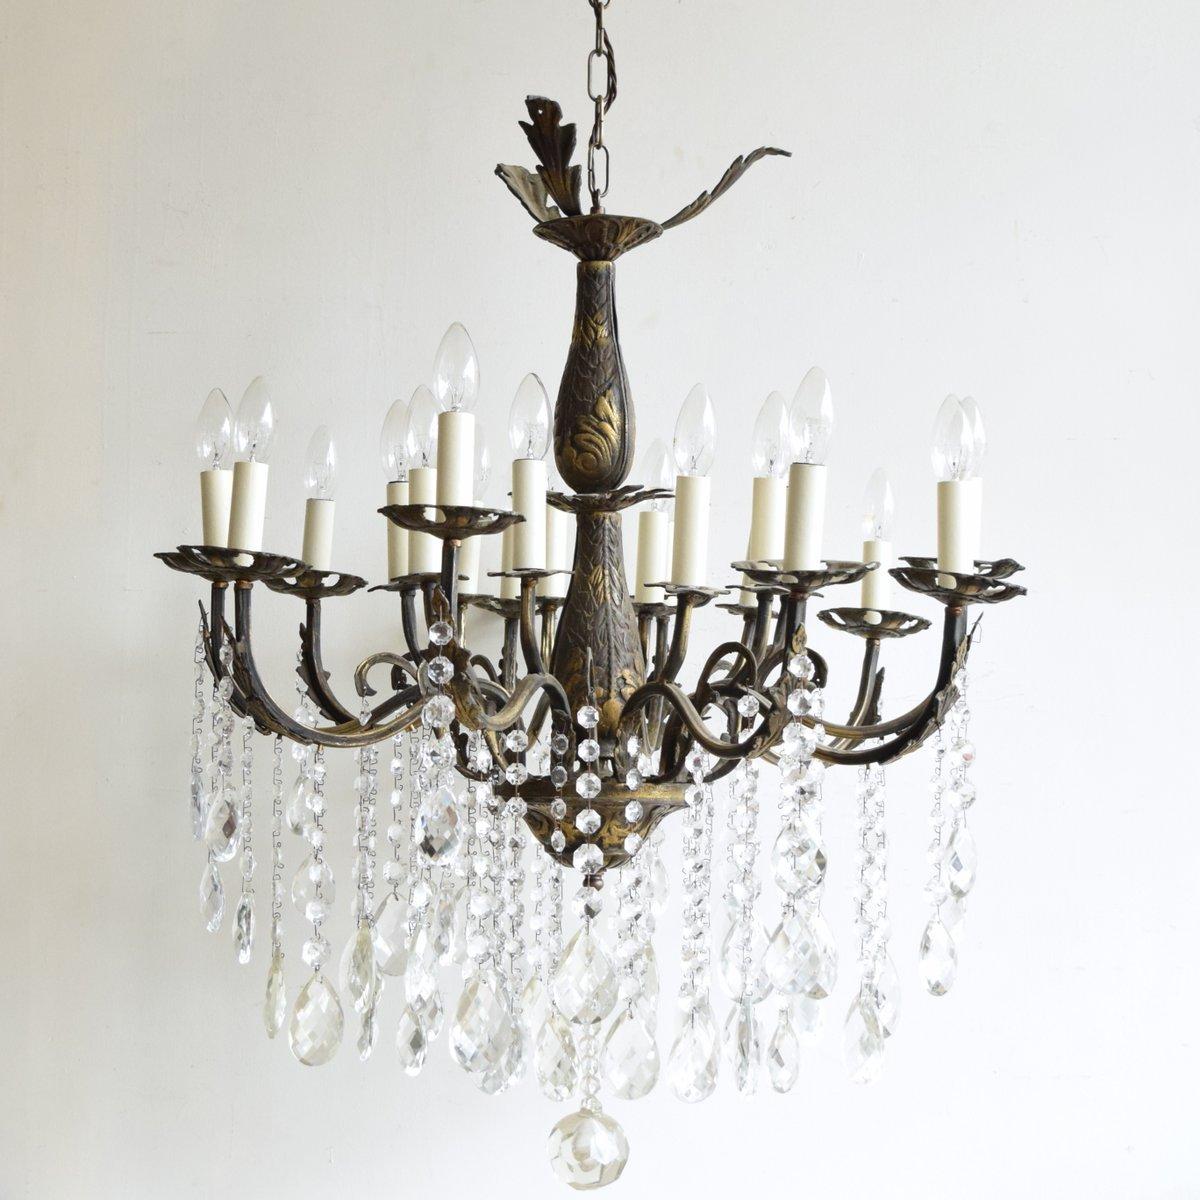 Large vintage french 16 light brass chandelier for sale at pamono large vintage french 16 light brass chandelier aloadofball Gallery